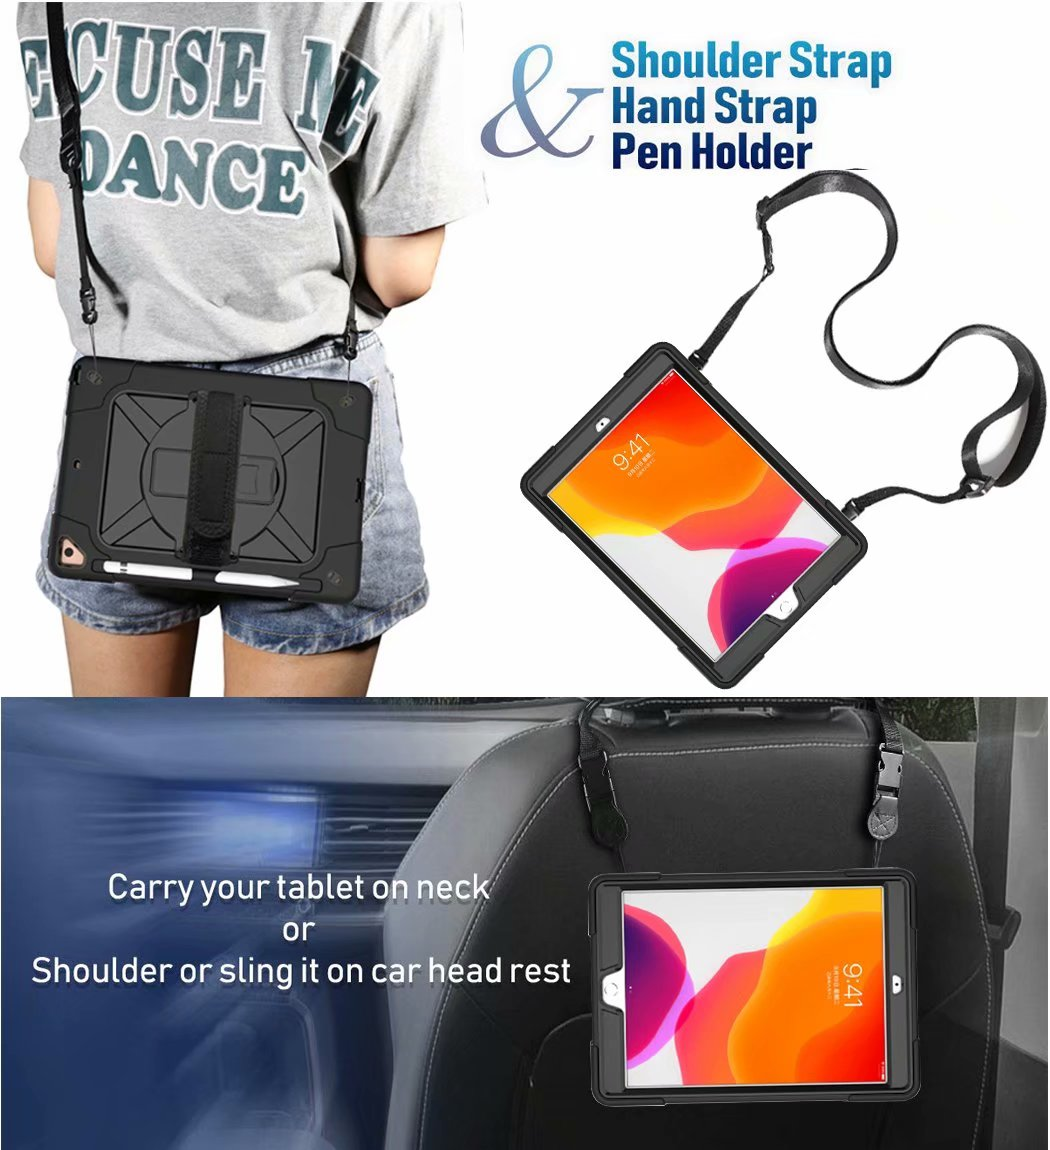 Heavy Hybrid 2020 Shockproof For Armor Rugged Case Pencil Holder 8th Duty Generation iPad